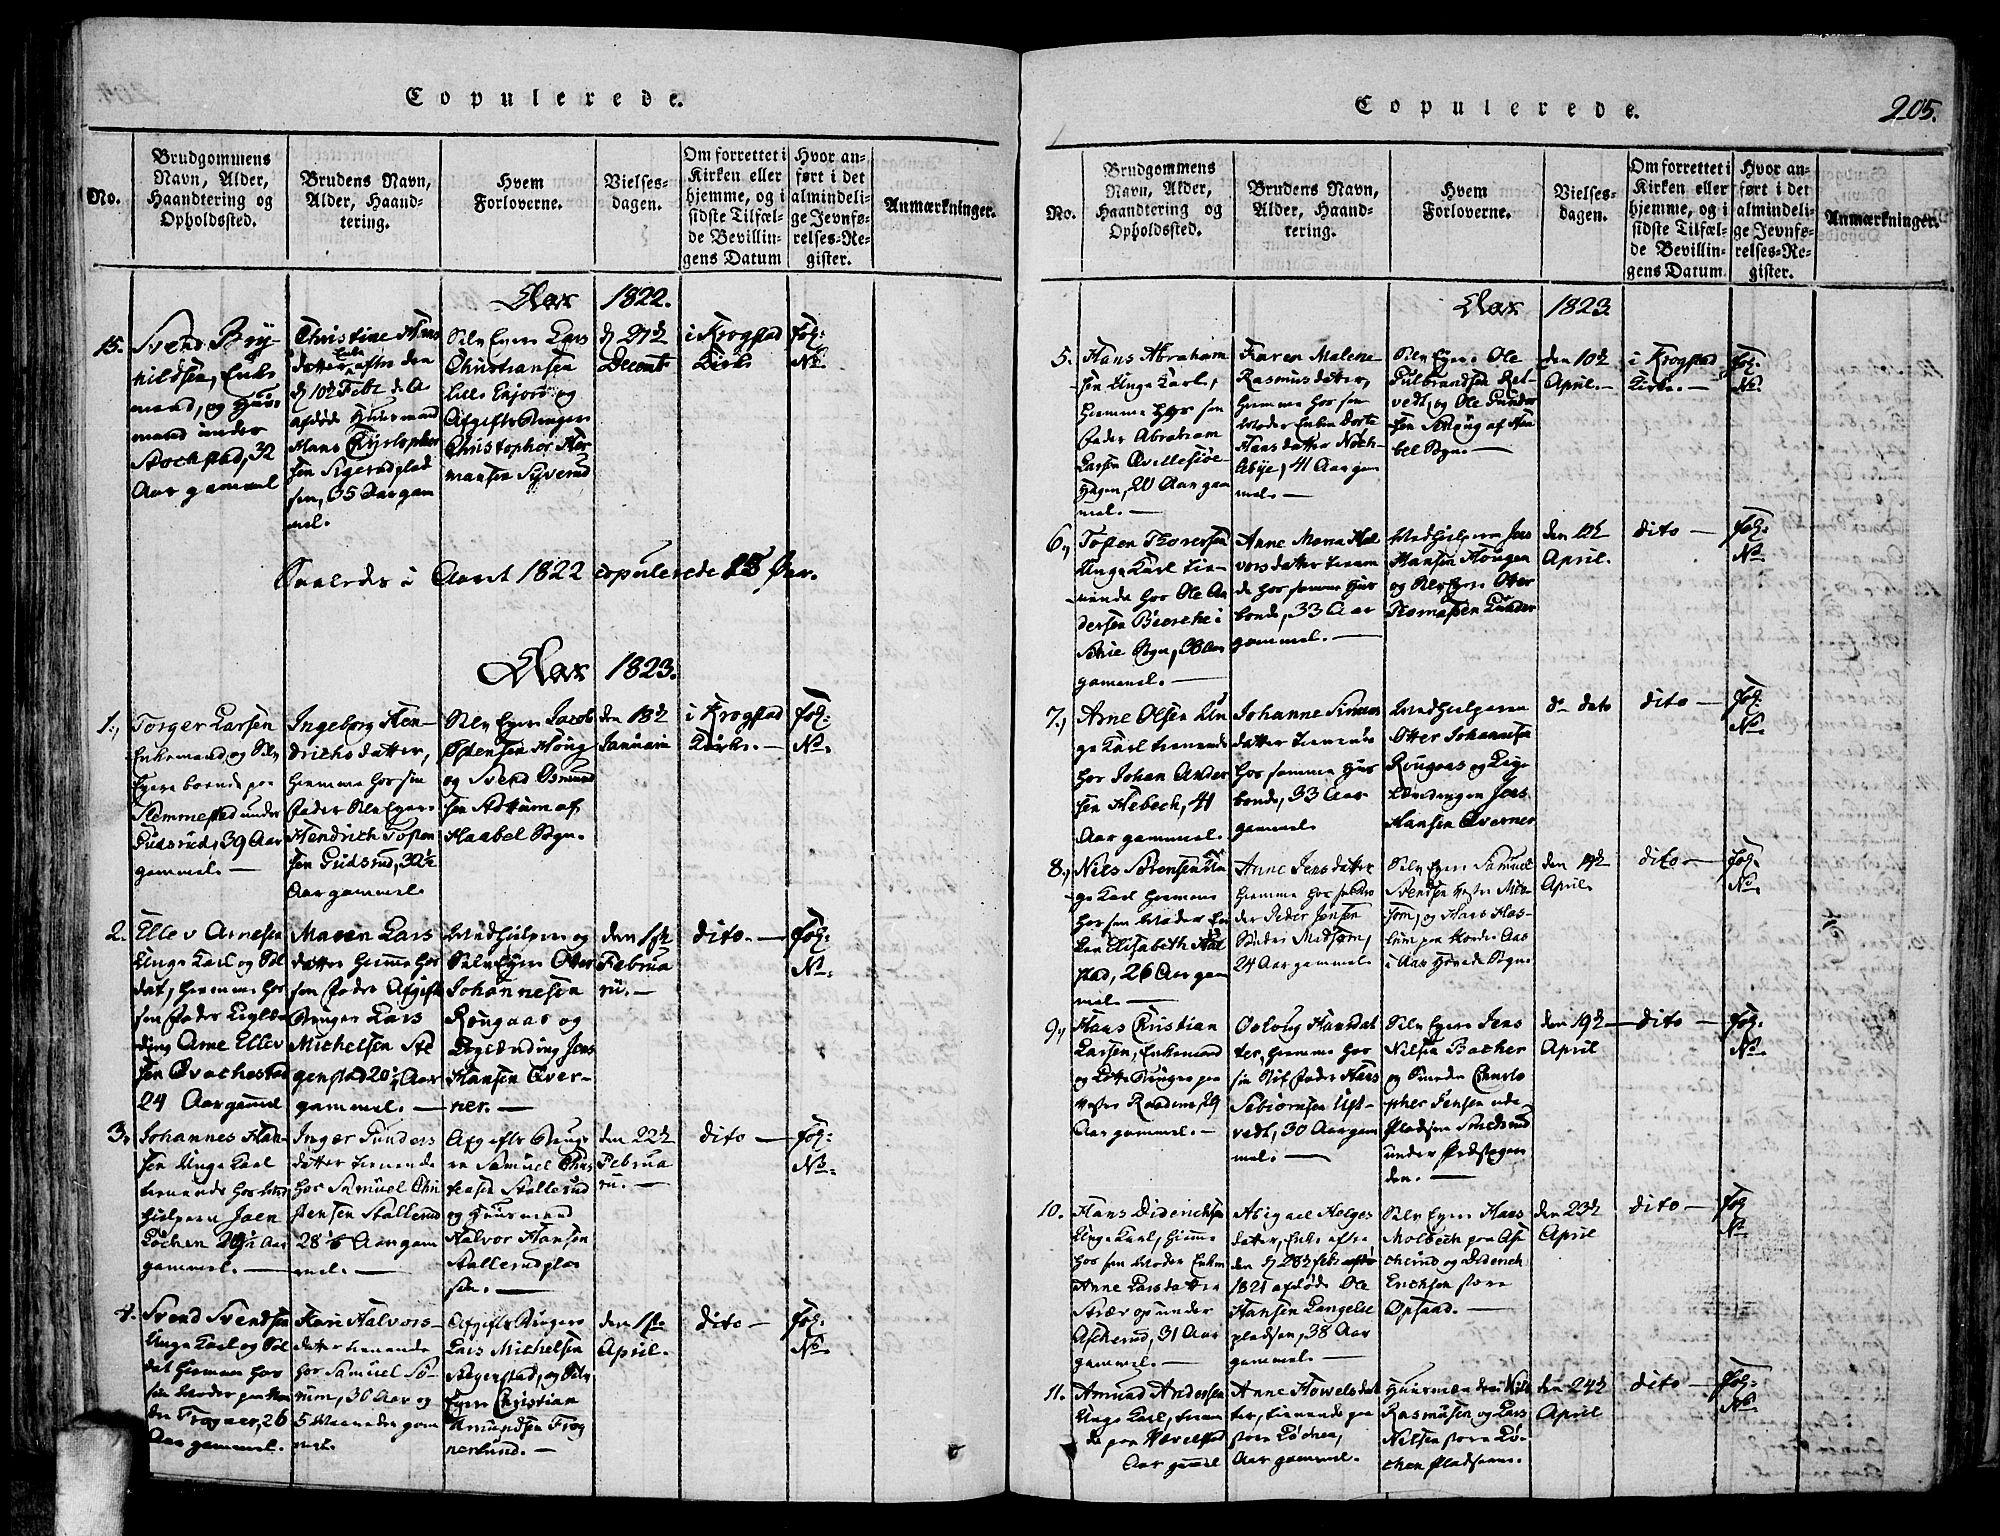 SAO, Kråkstad prestekontor Kirkebøker, F/Fa/L0003: Parish register (official) no. I 3, 1813-1824, p. 205